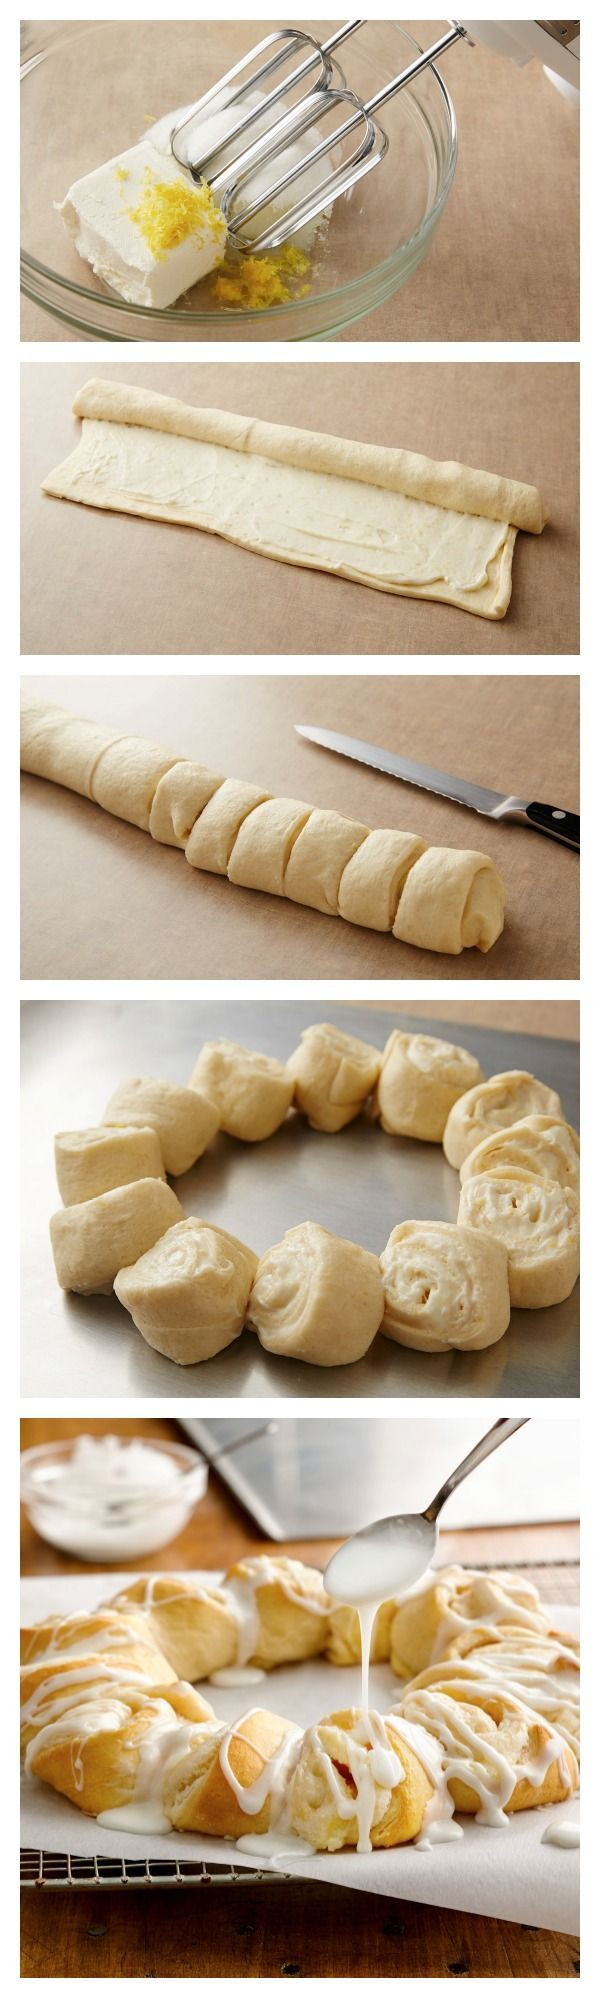 Lemon-Cream Cheese Crescent Ring Recipe